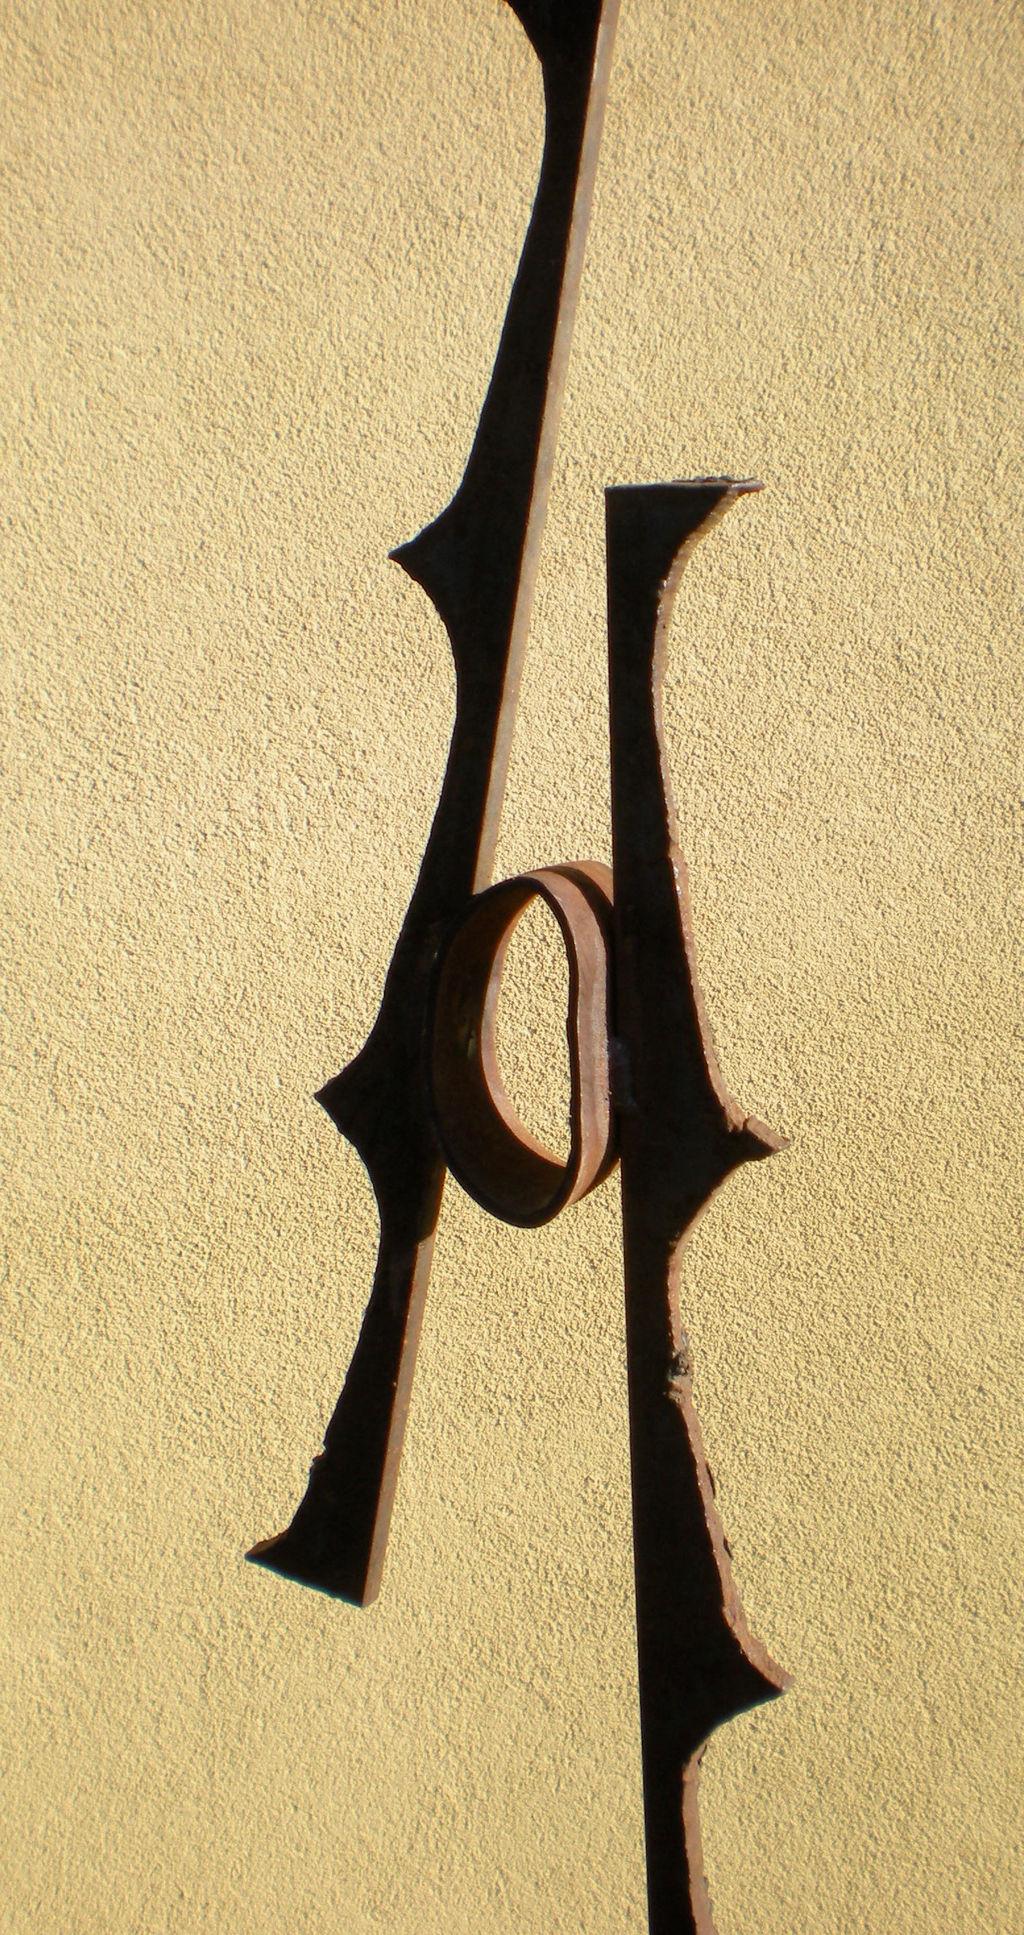 Jon Carpenter Metal Sculpture | Wix.com